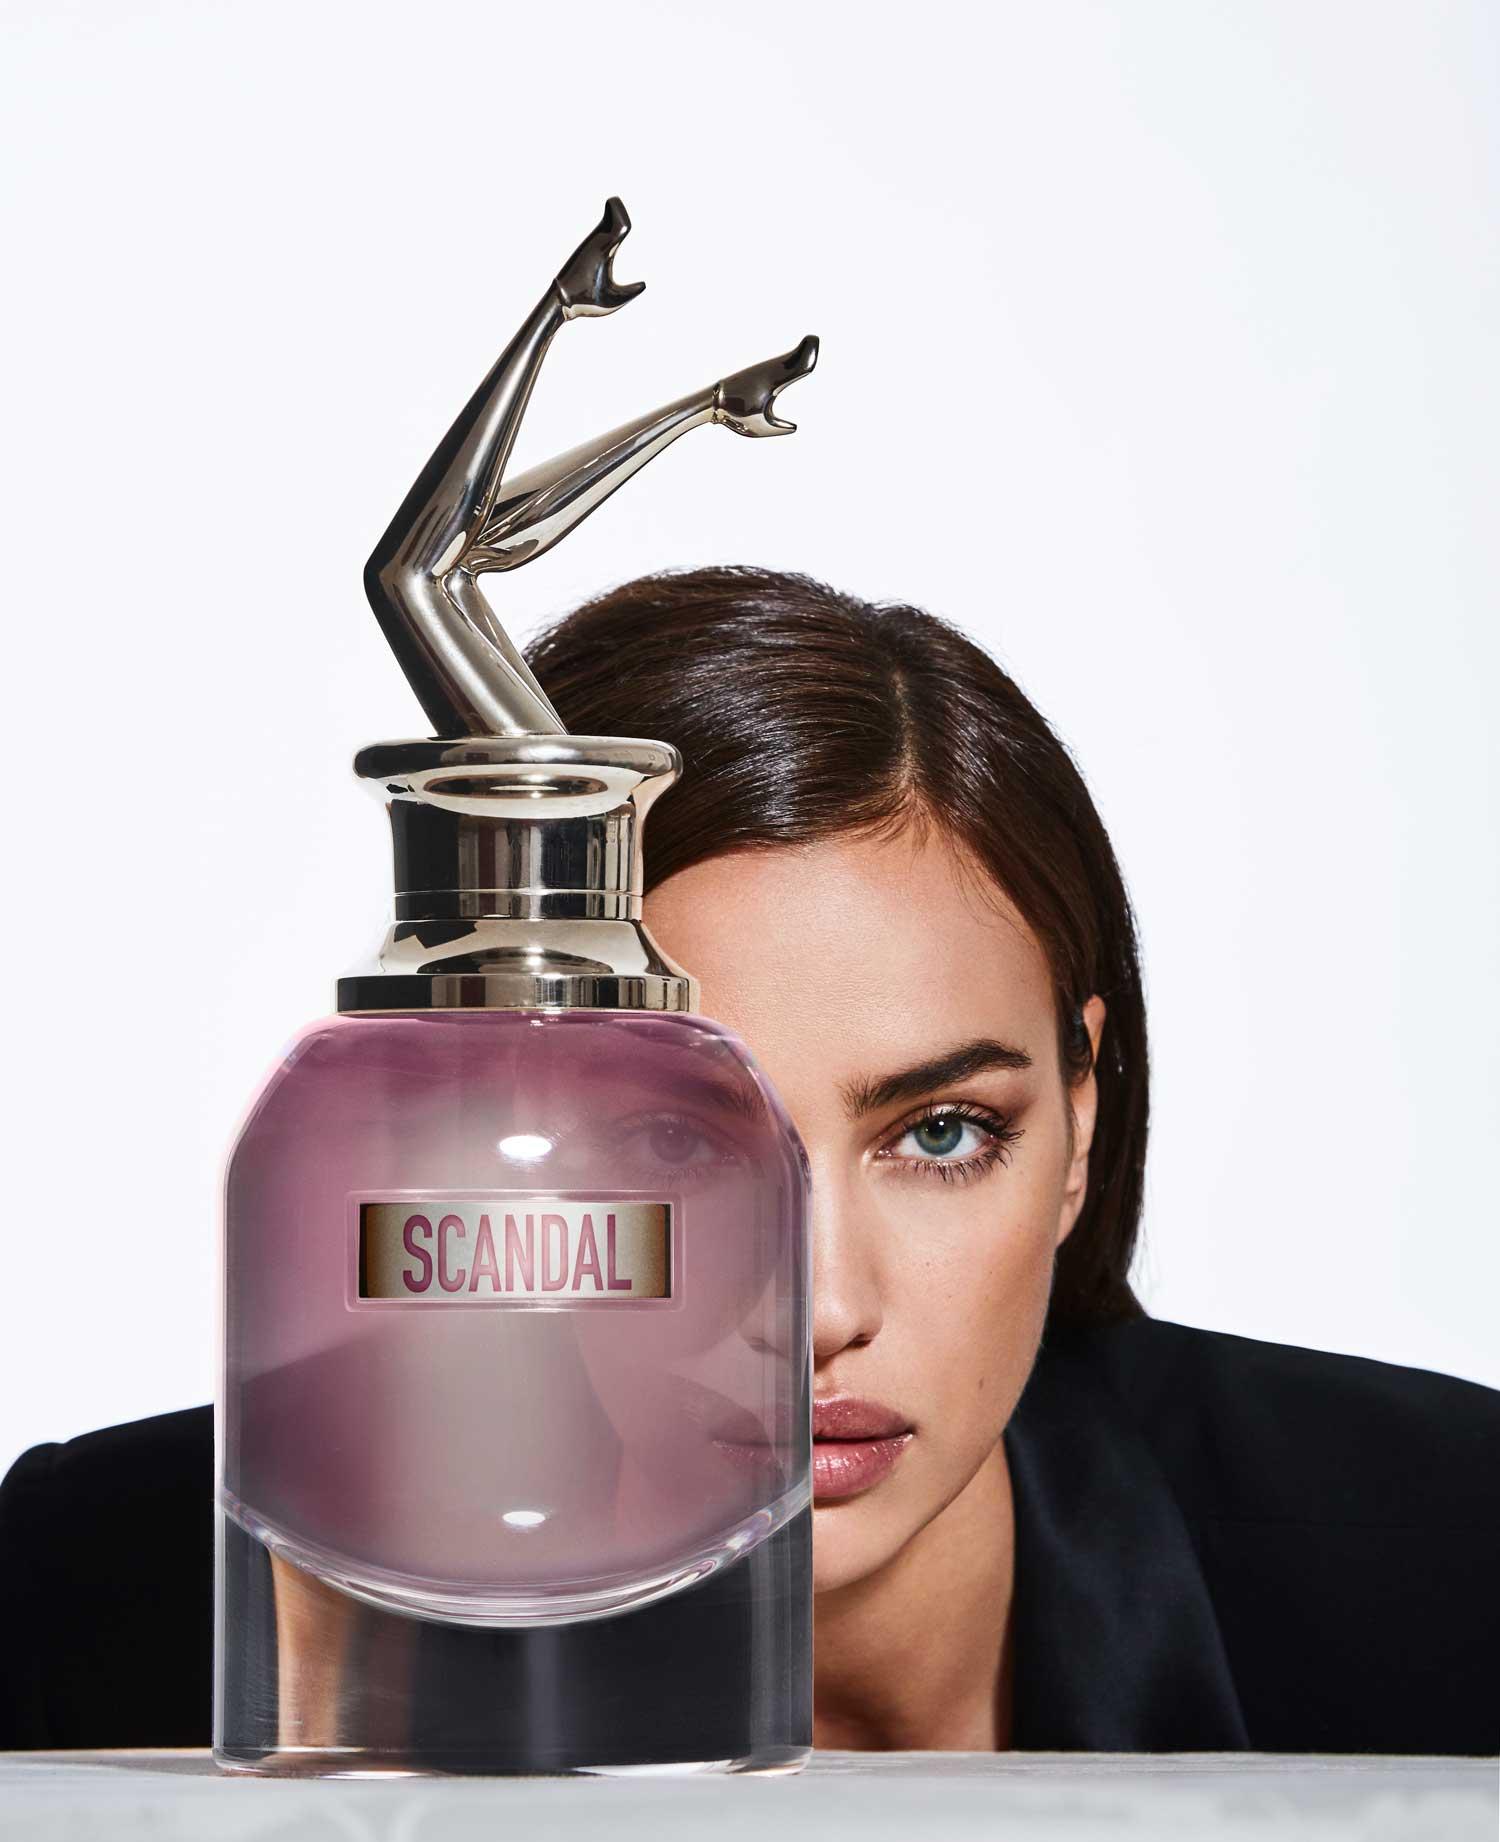 Scandal A Paris Jean Paul Gaultier Perfume A New Fragrance For